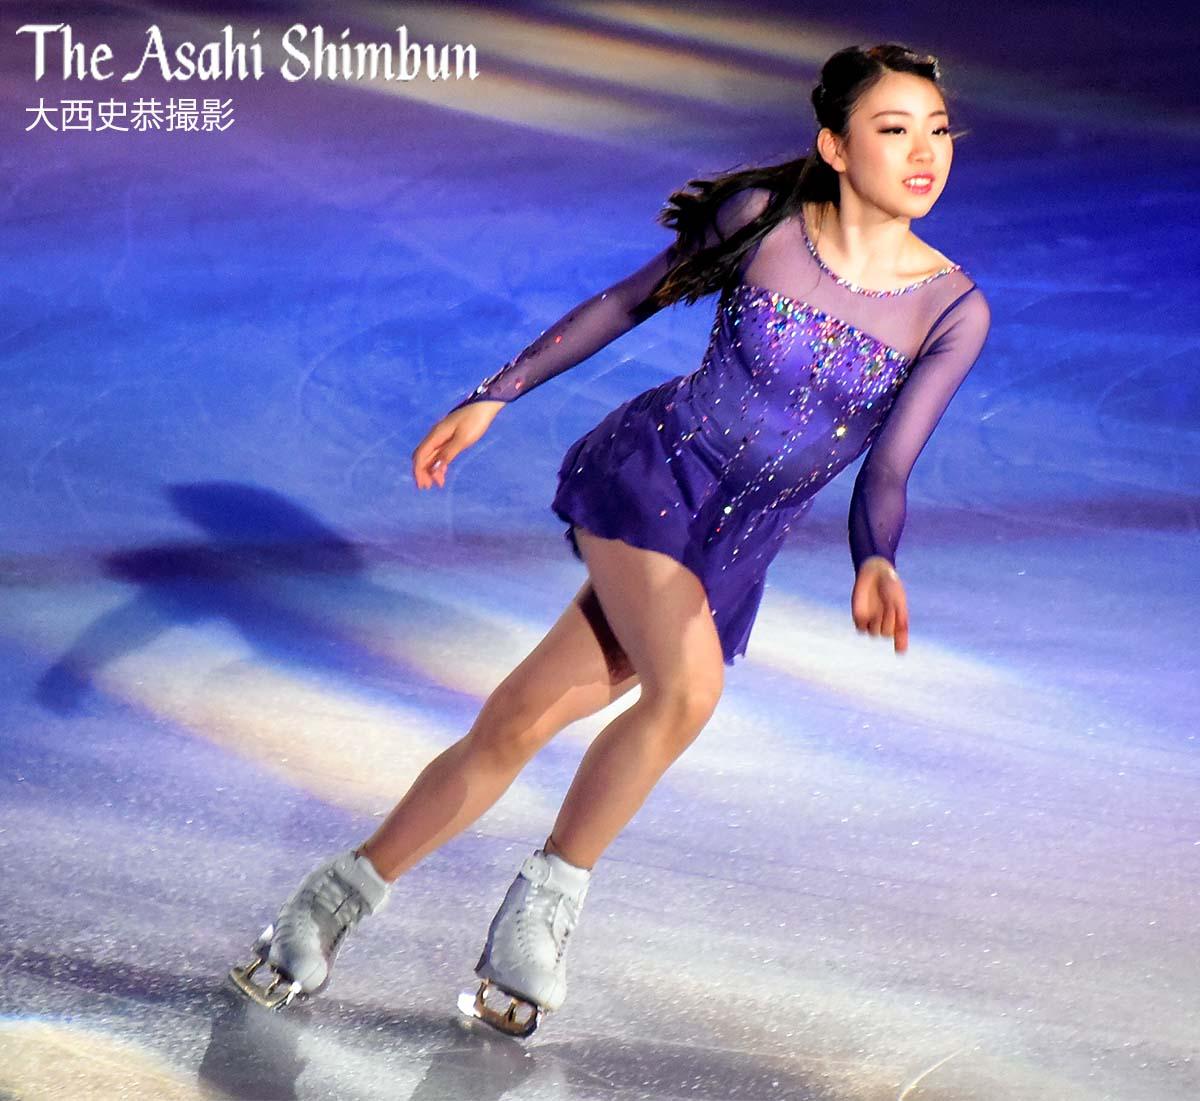 http//t.asahi.com/w2oy フィギュアスケート のアイスショー